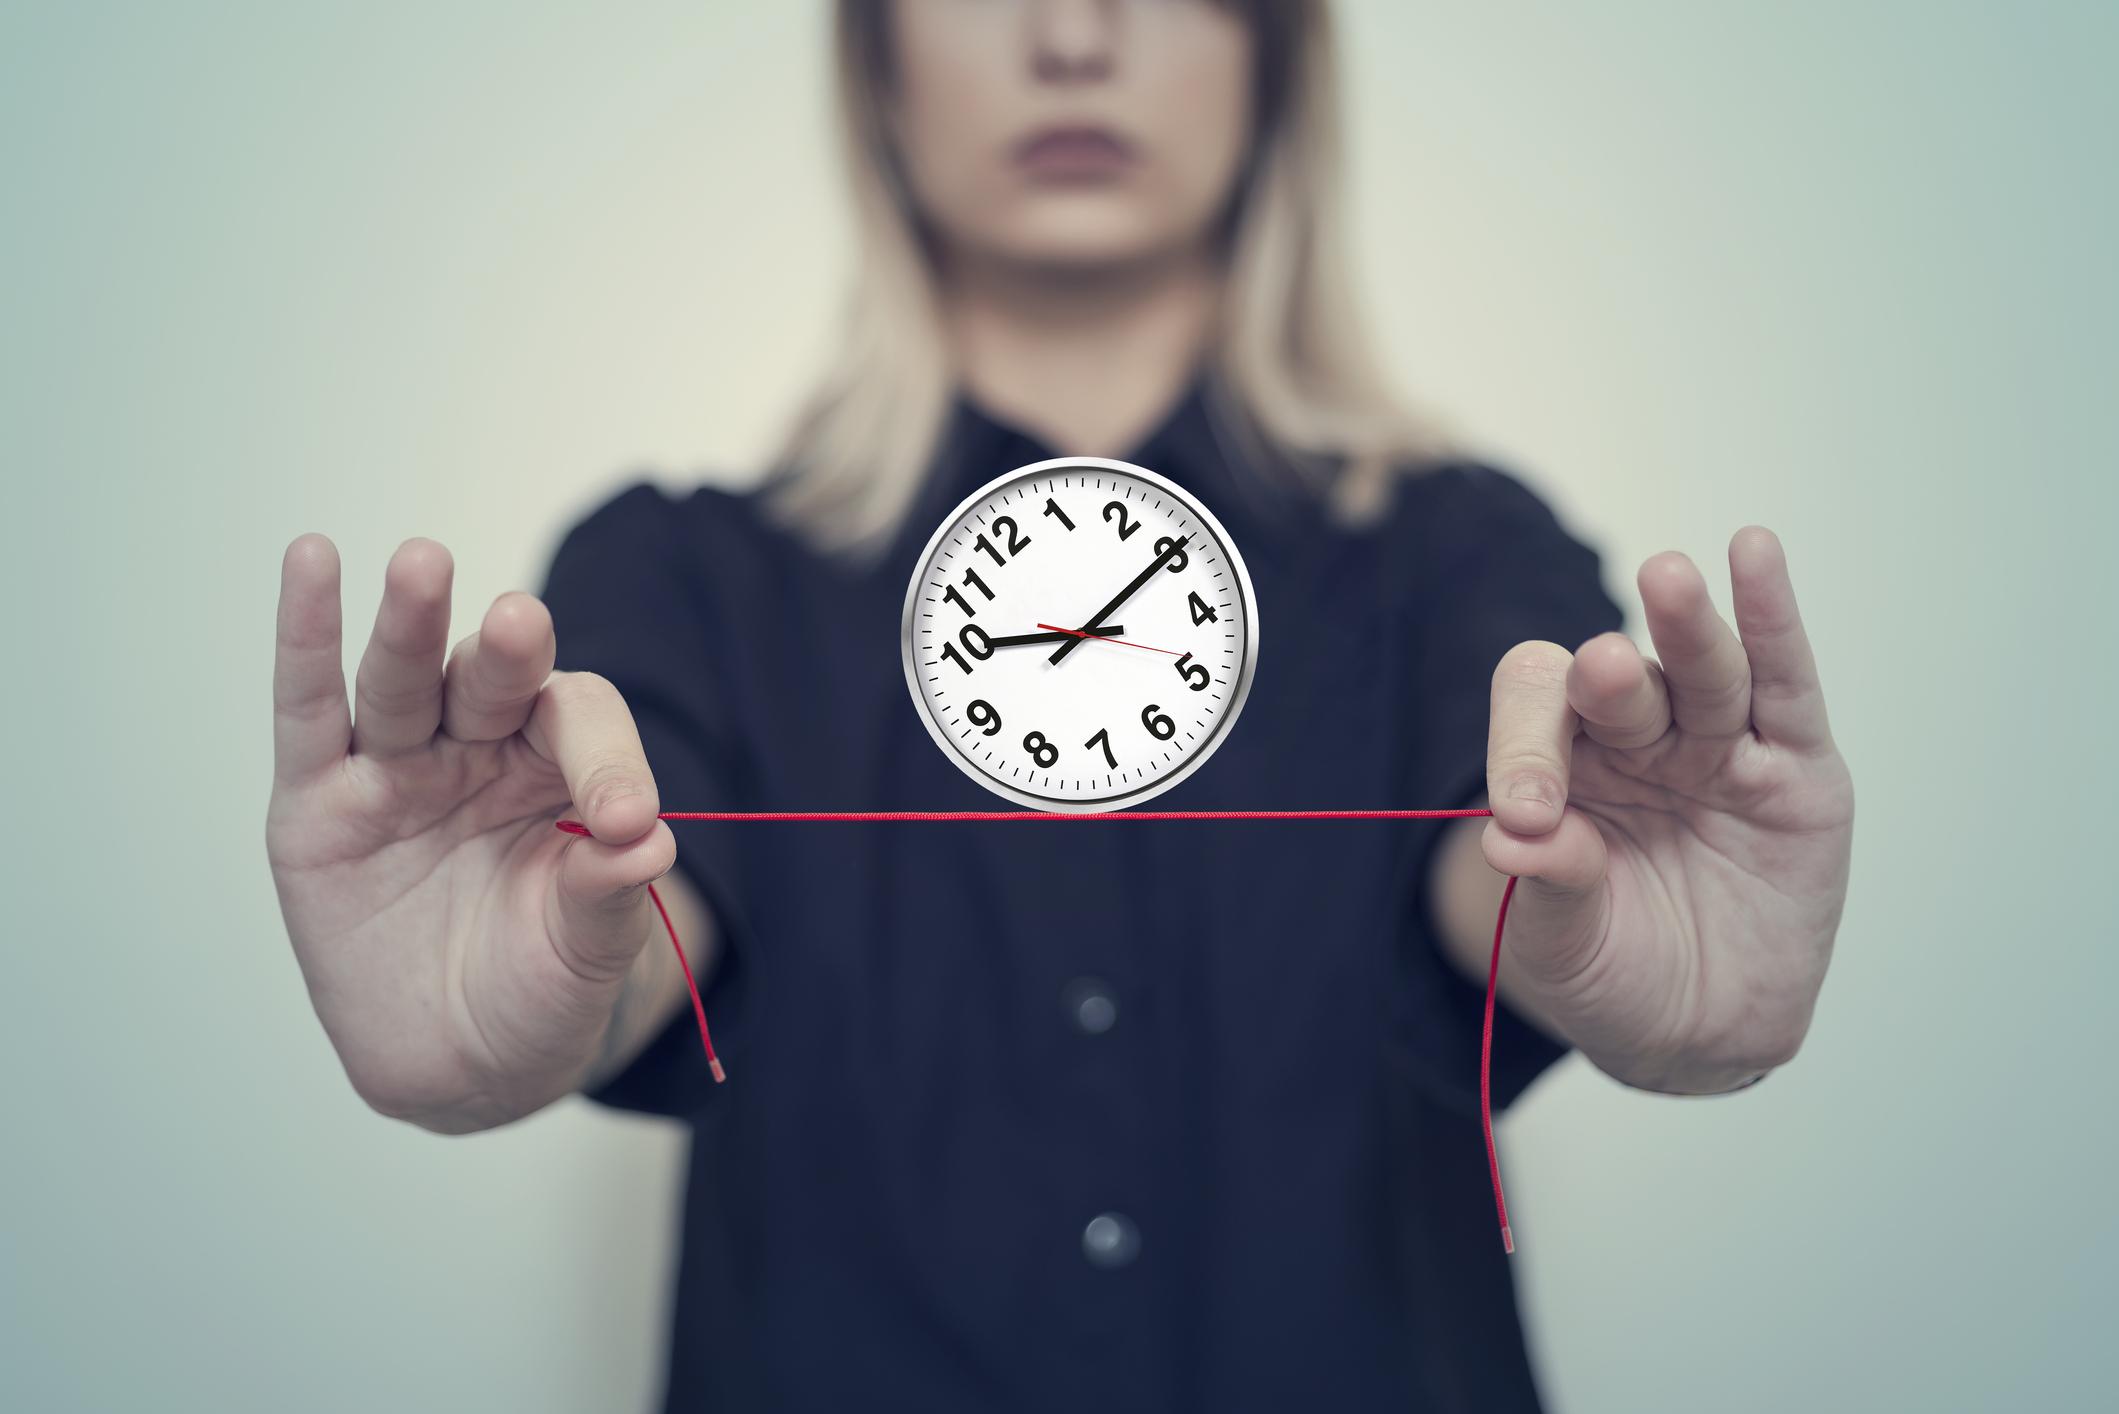 Woman's hands hold a wall clock balanced on a thread